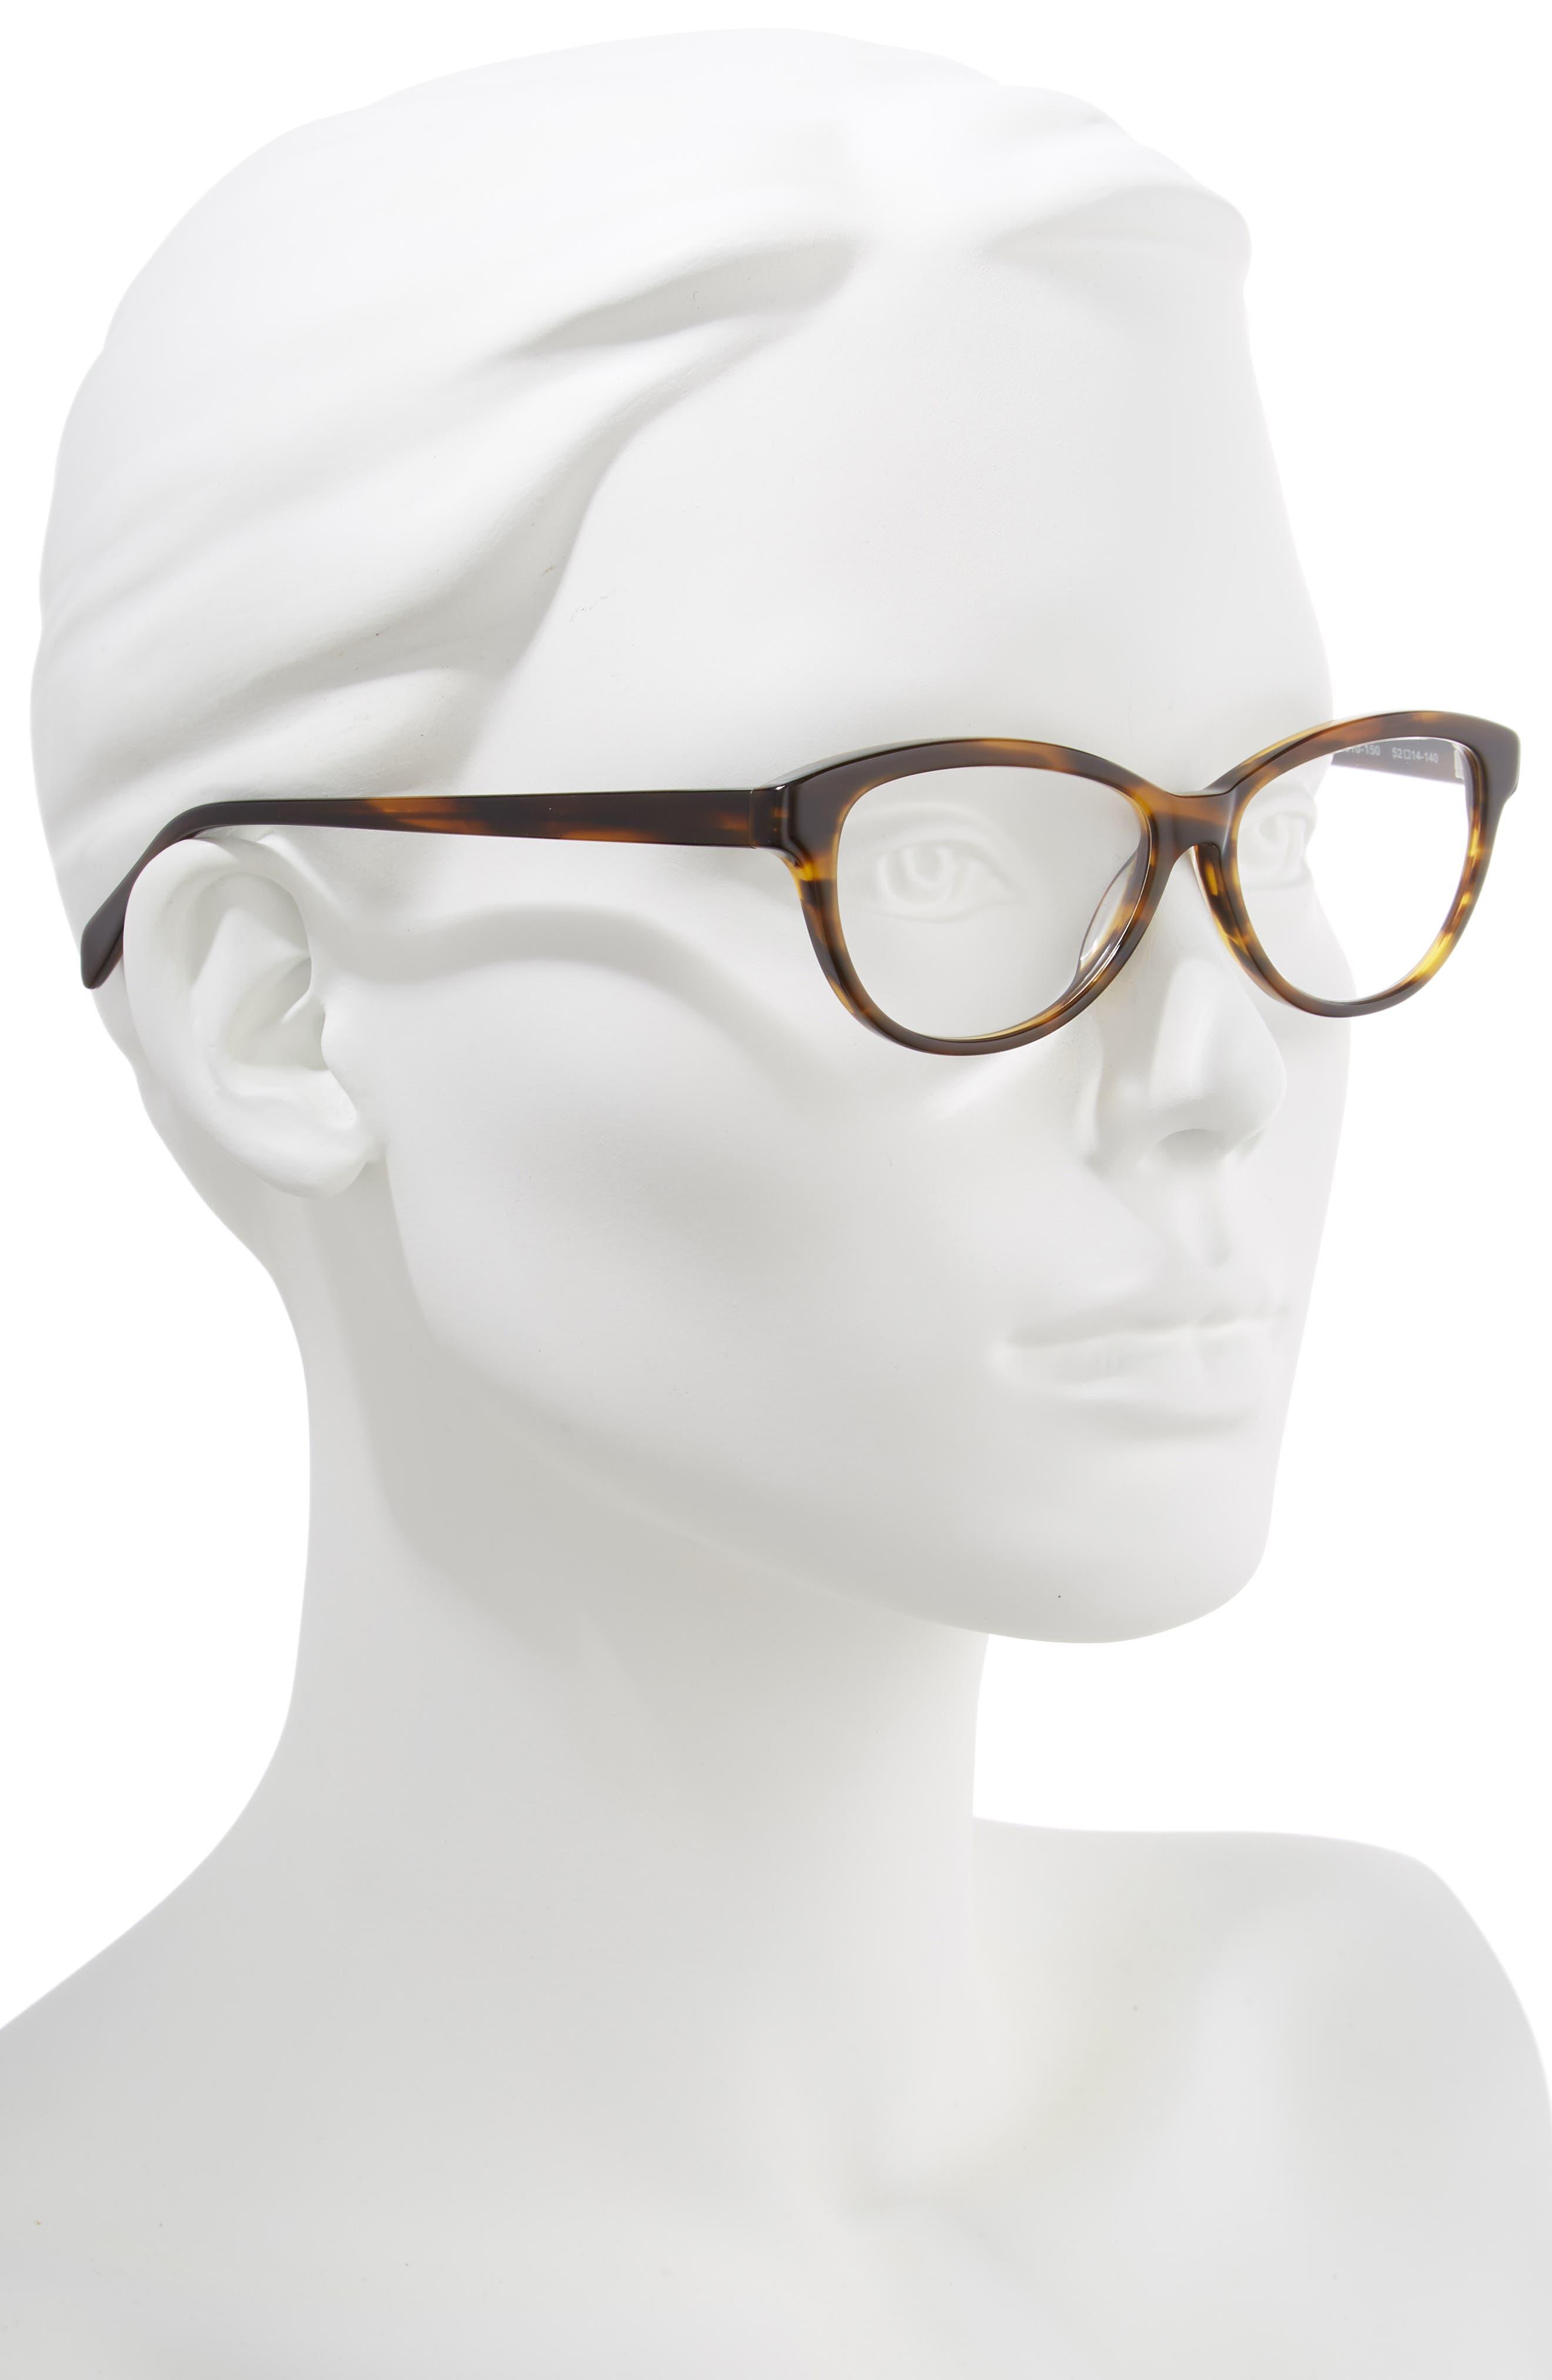 4630a87d9cc Reading Glasses Sunglasses for Women